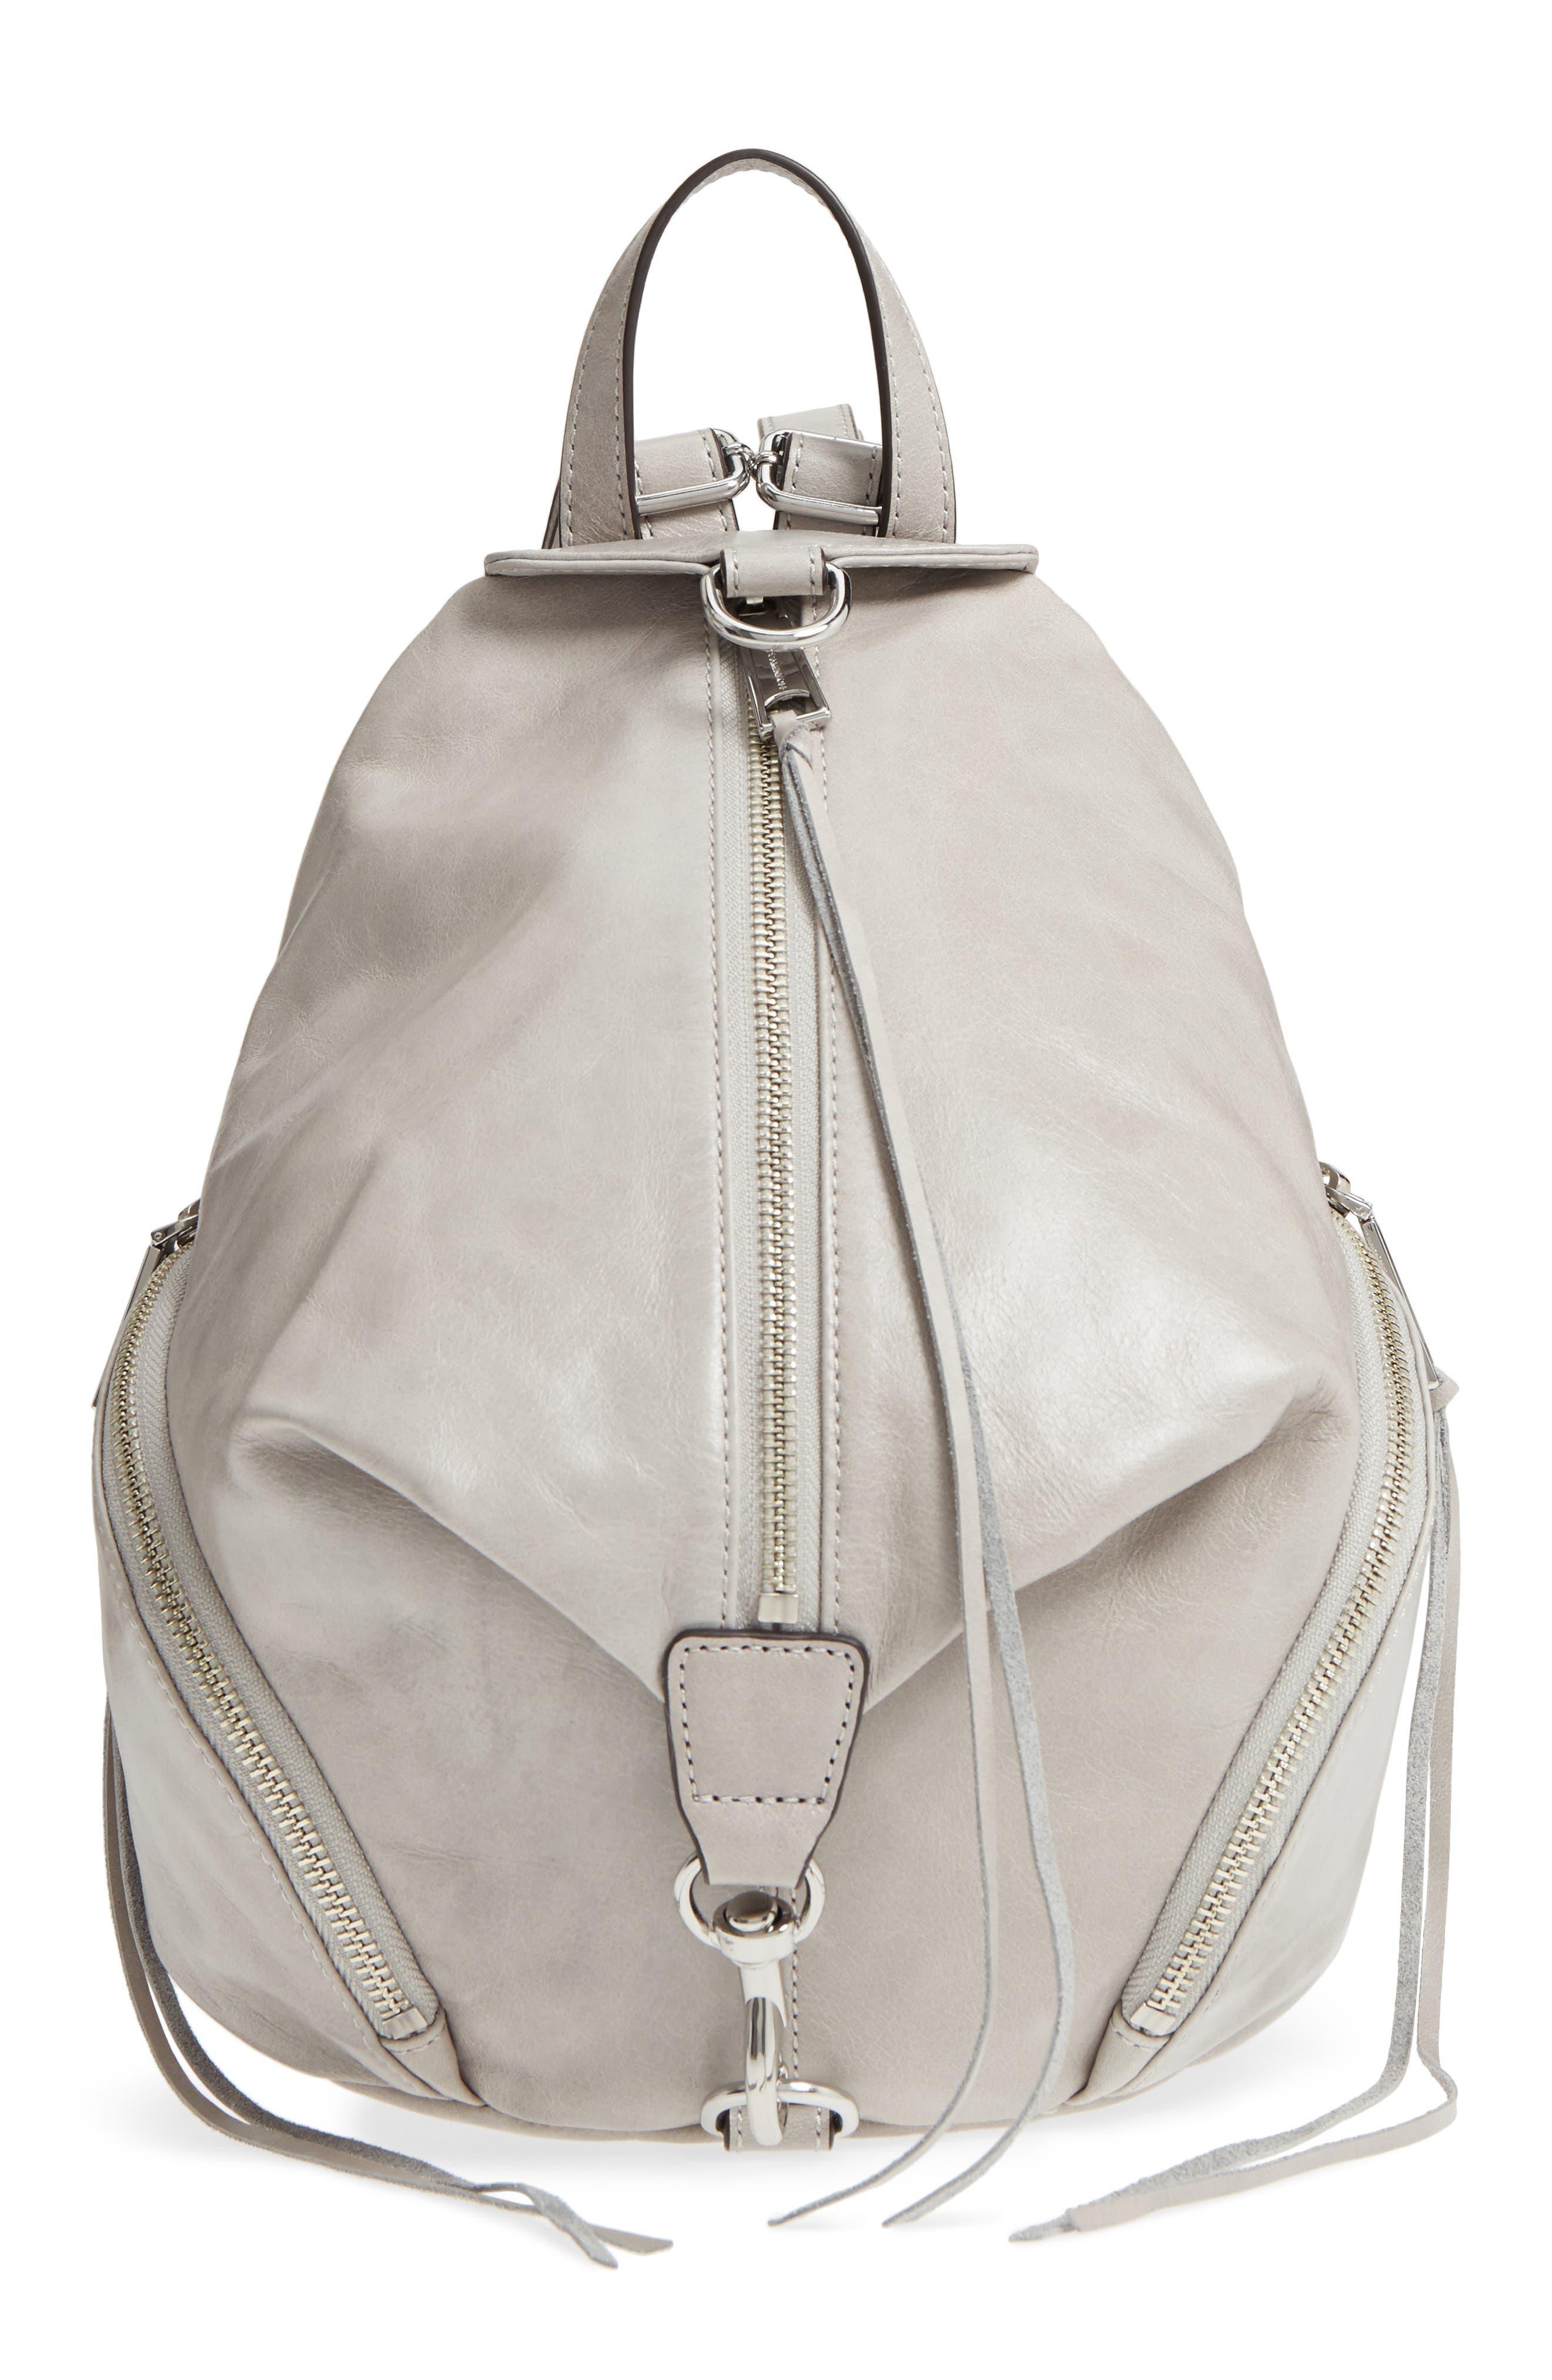 Medium Julian Leather Backpack,                         Main,                         color, 090